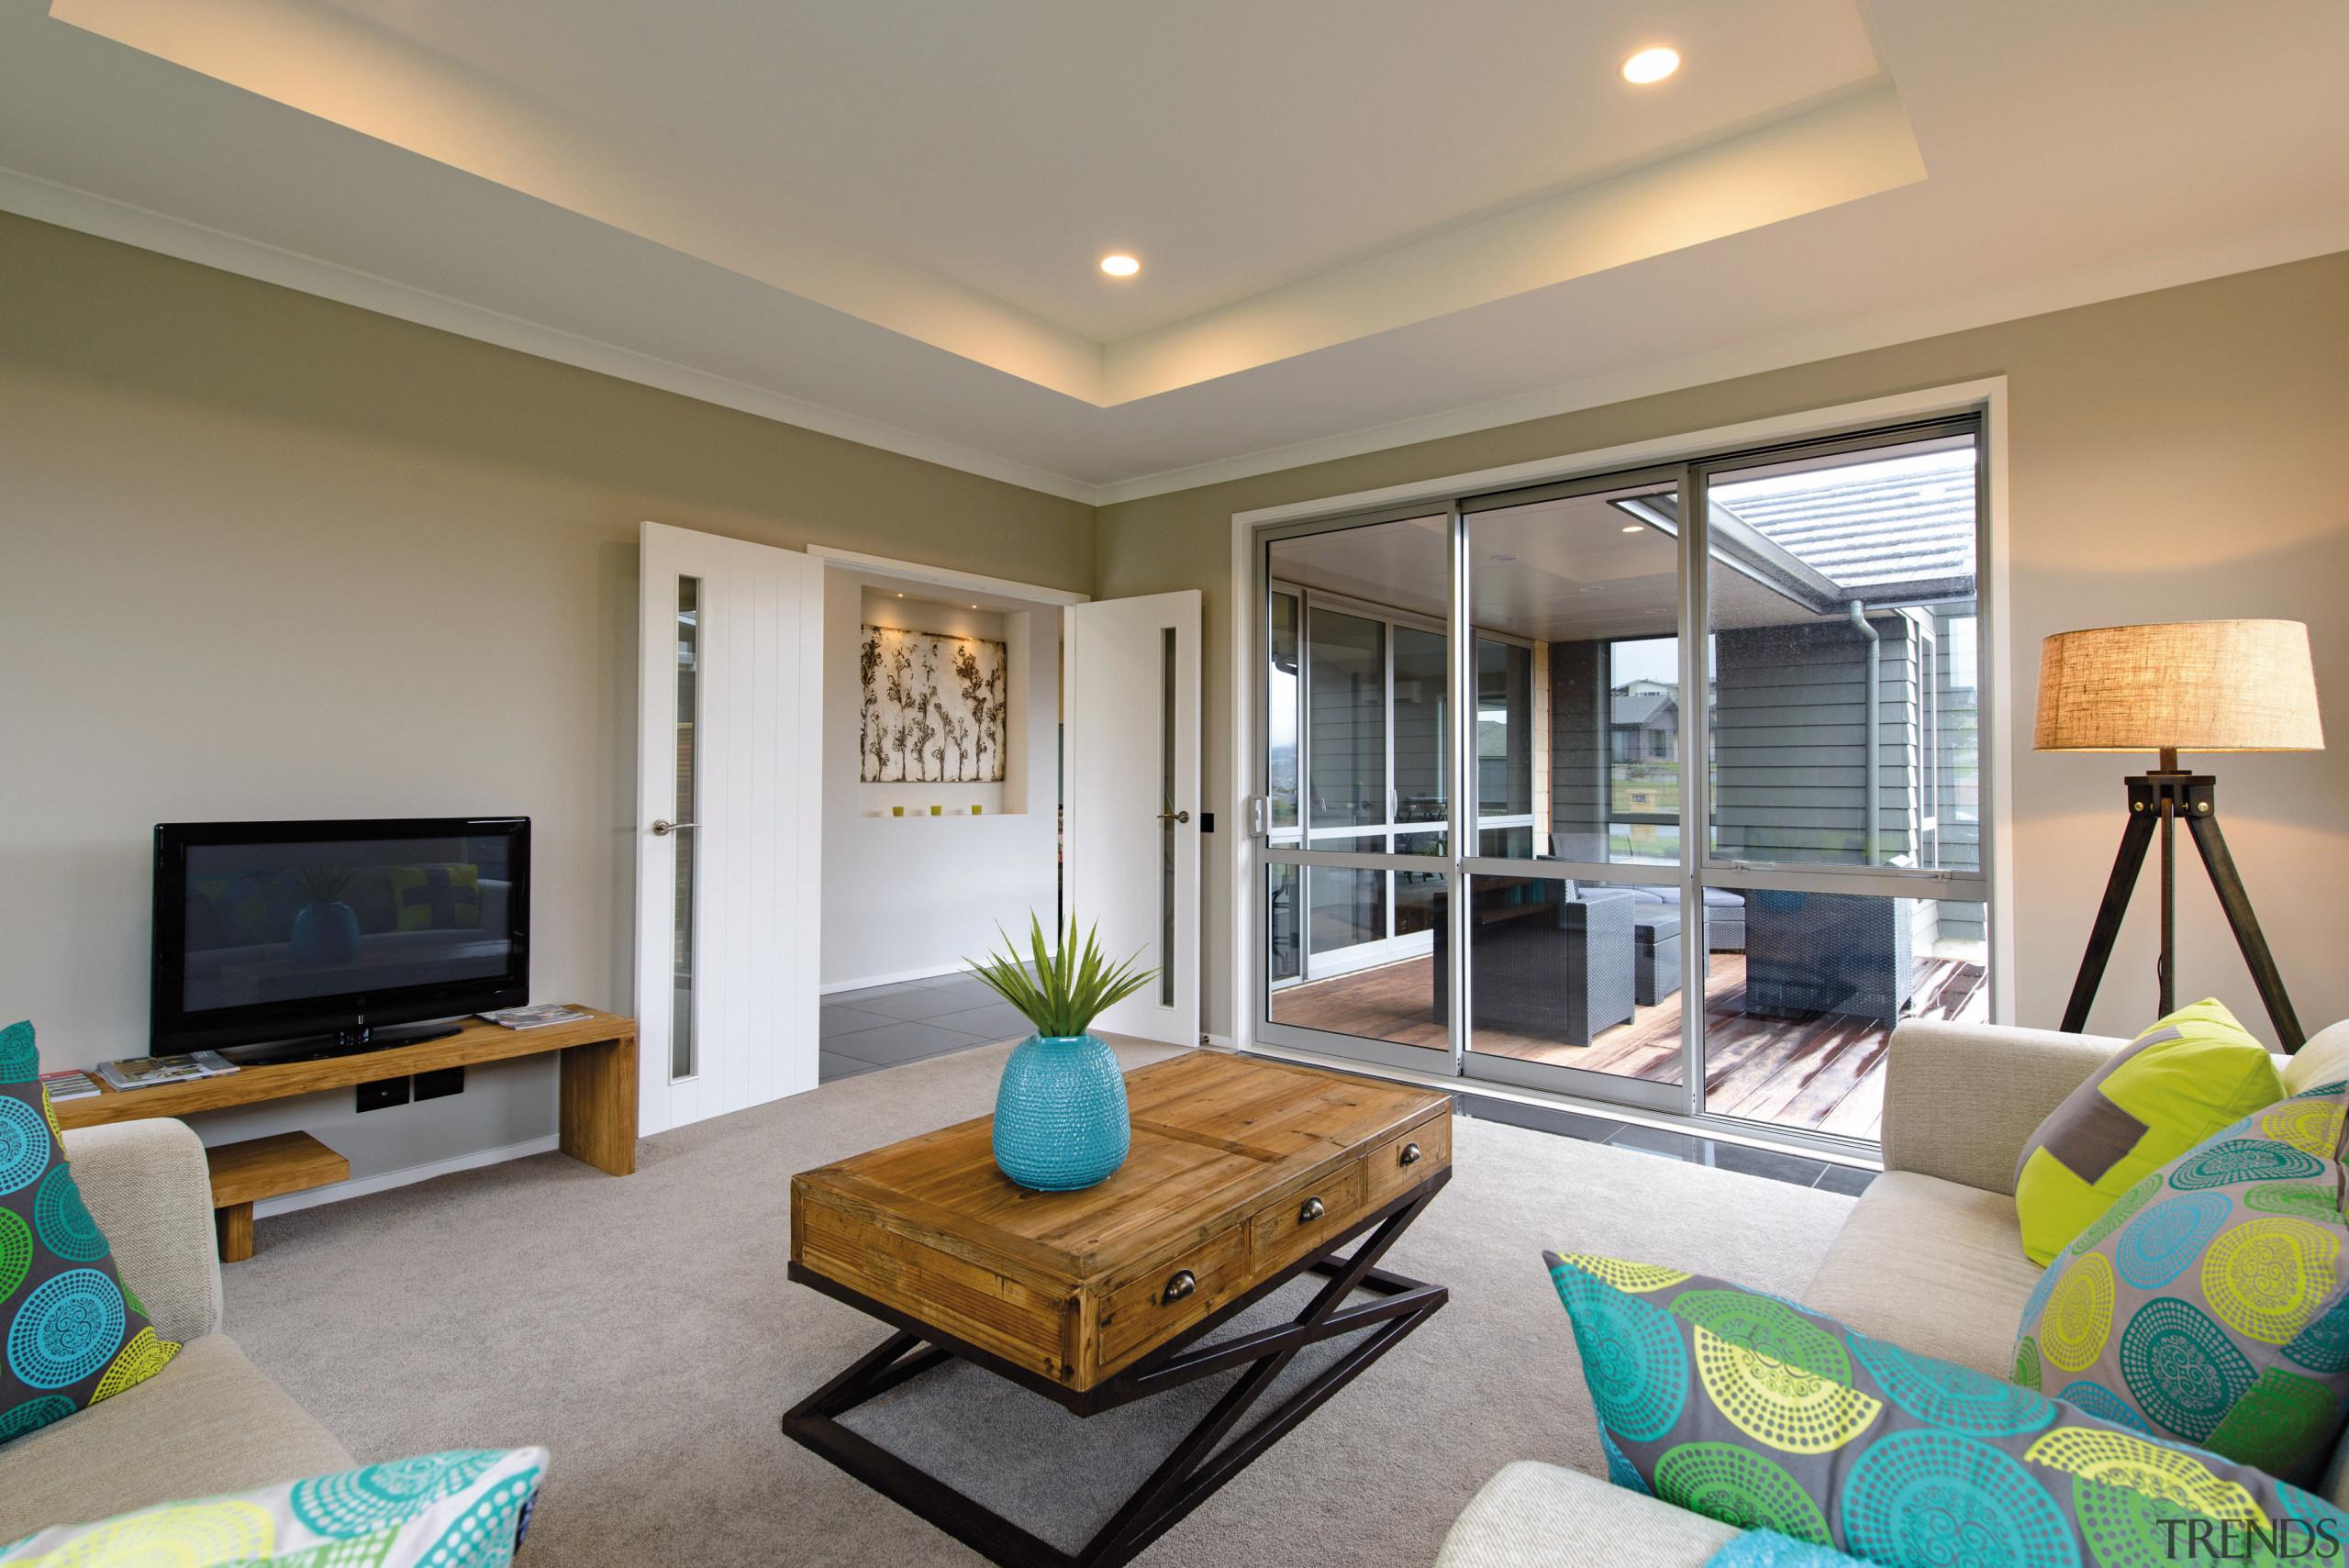 GJ Gardner Homes show home living - GJ ceiling, home, interior design, living room, property, real estate, room, gray